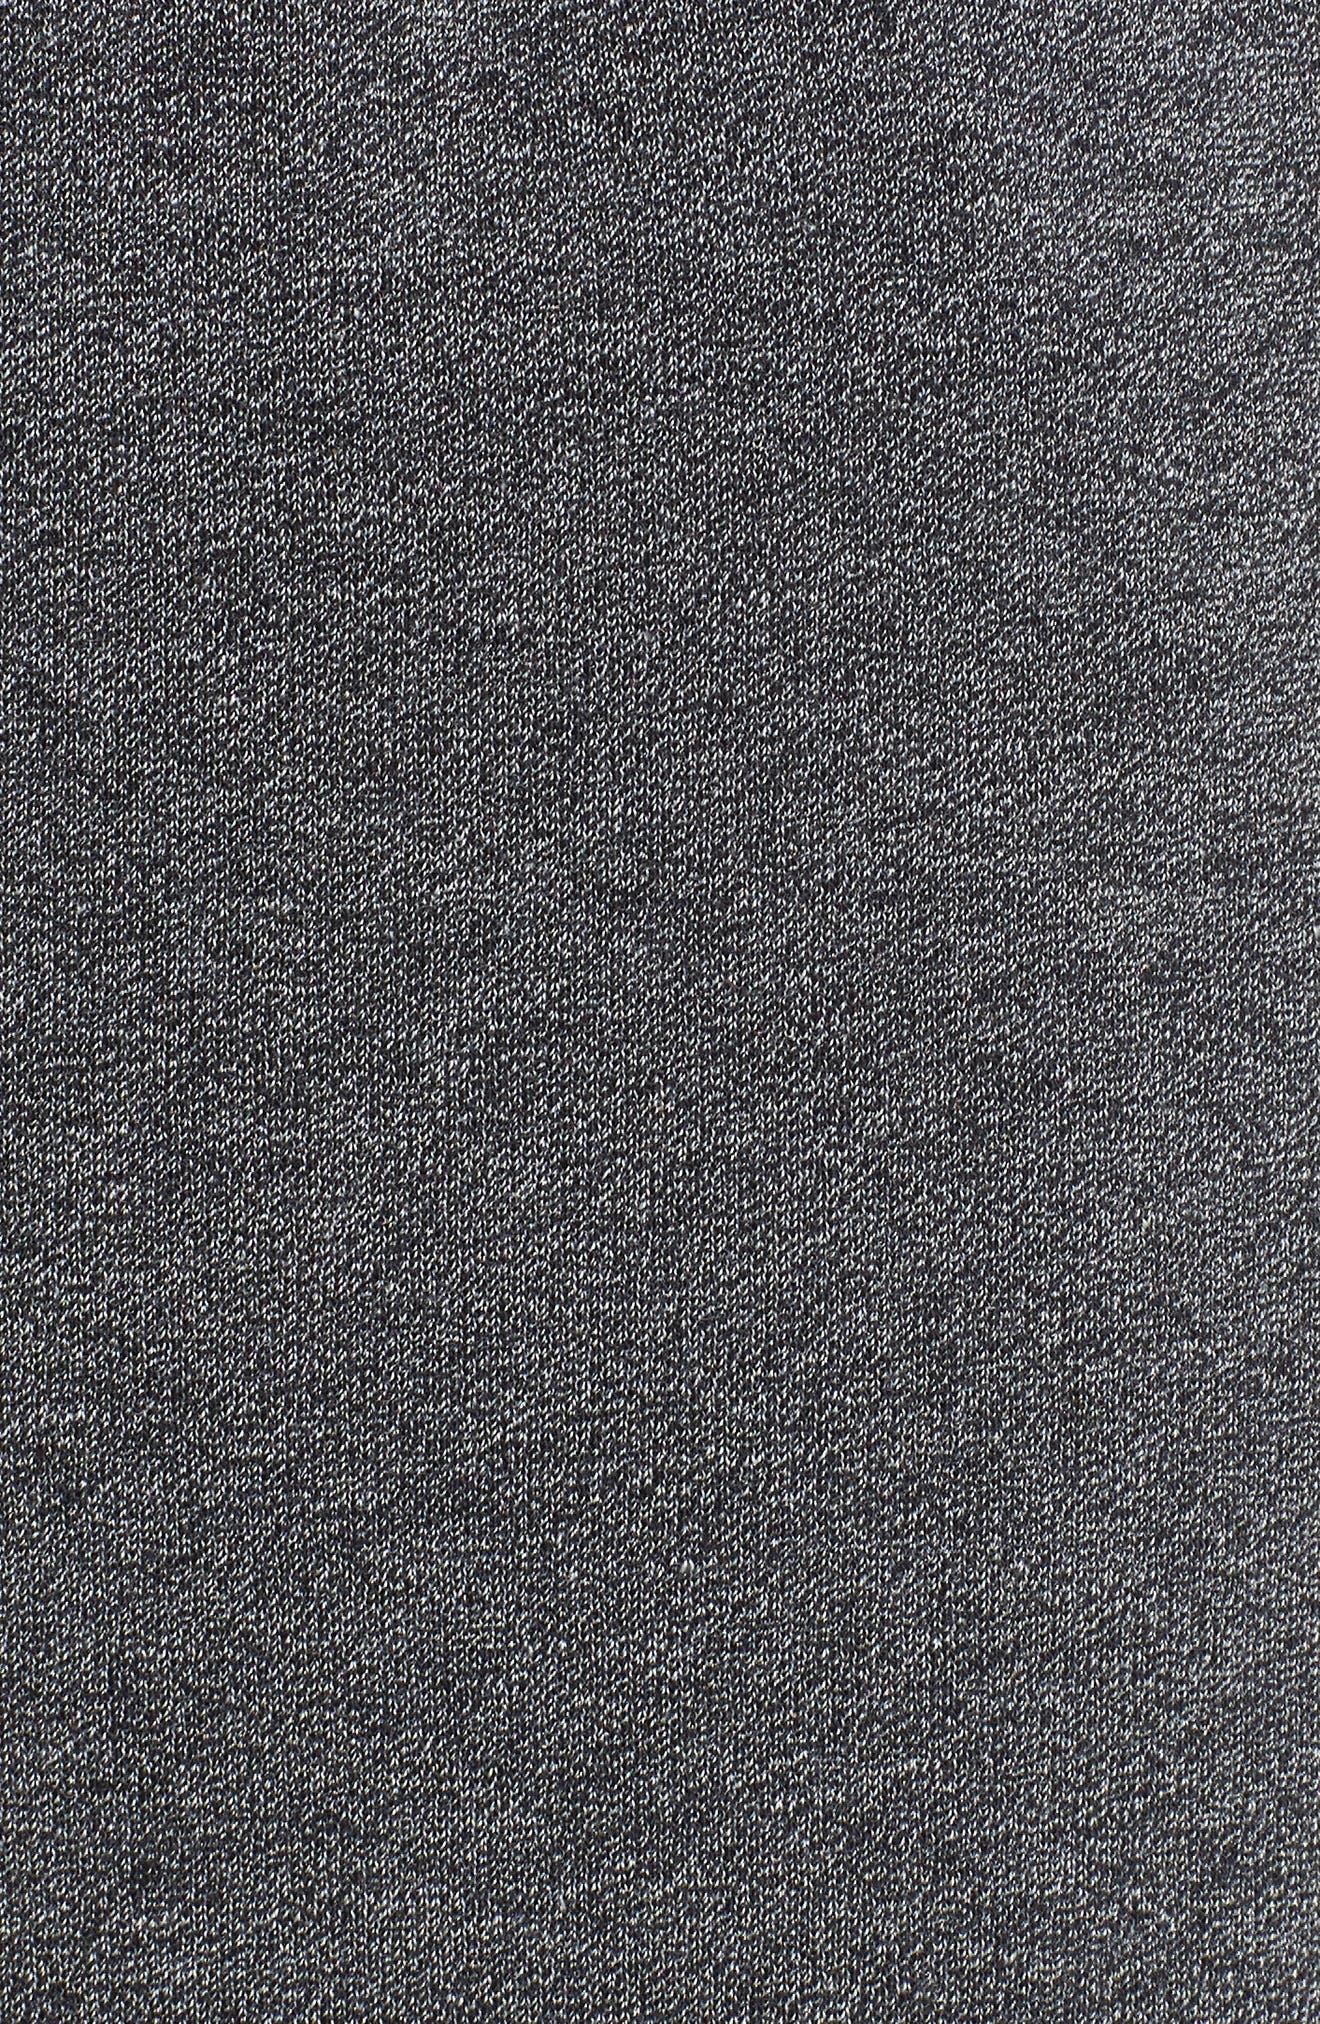 Sportswear ACG Heritage Pants,                             Alternate thumbnail 5, color,                             BLACK/ HTR/ SAIL